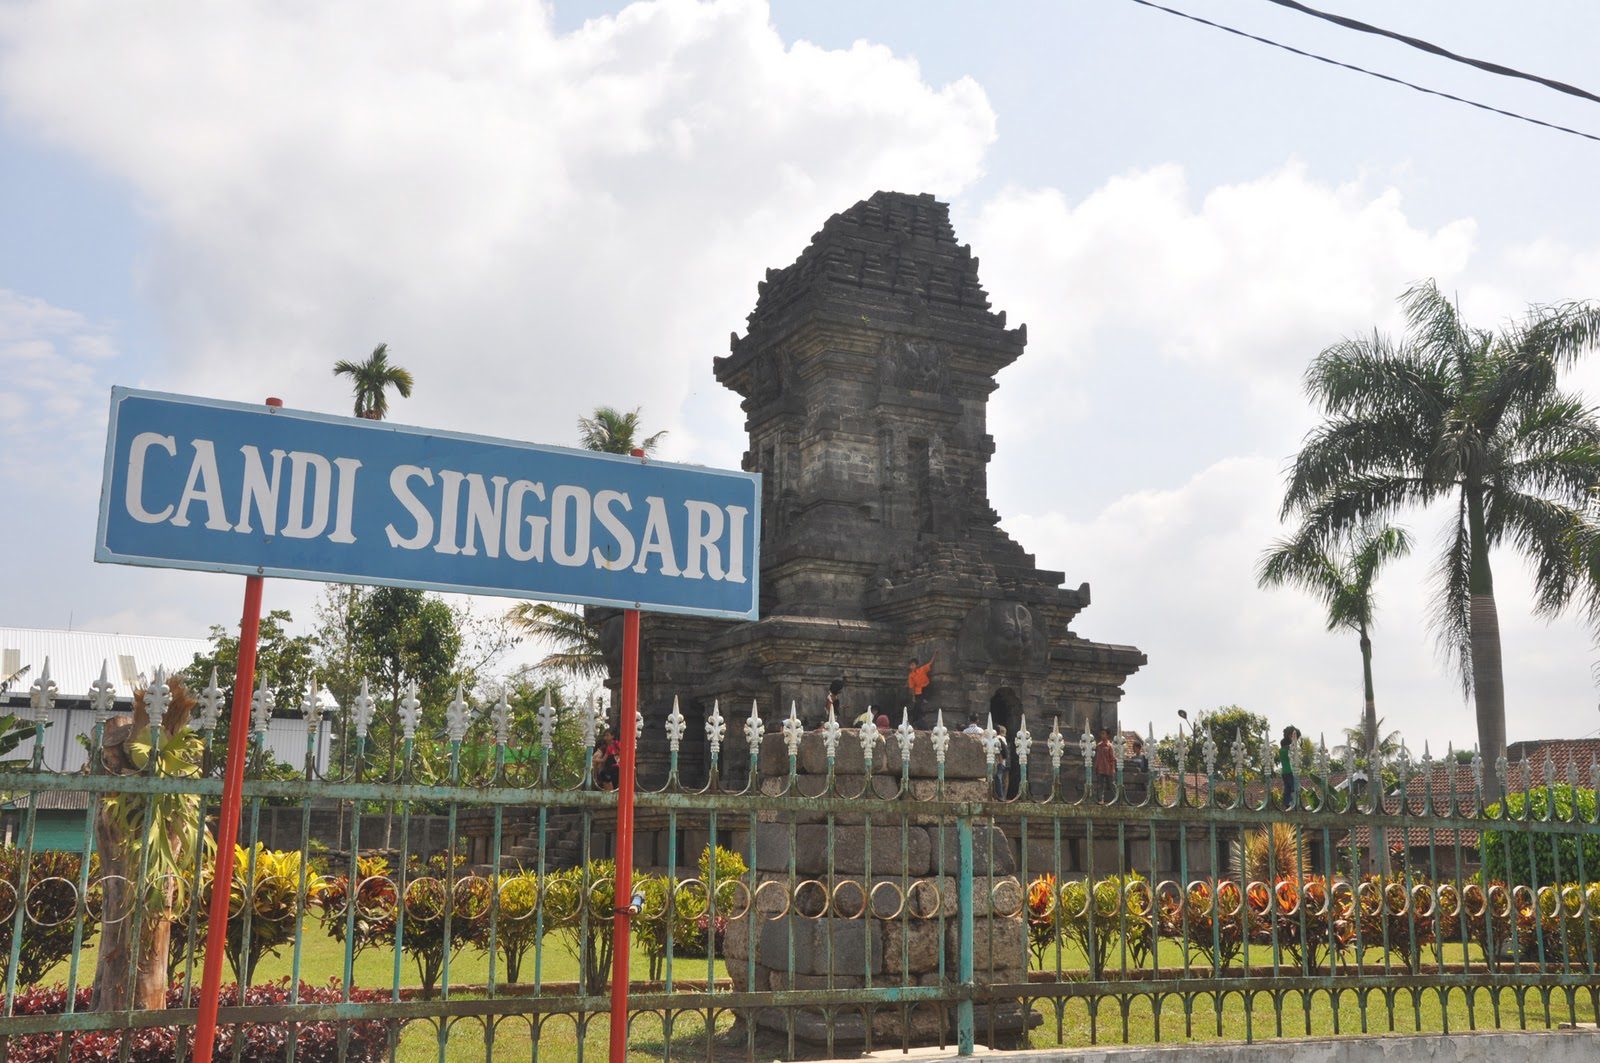 Candi Singosari Ibu Kota Kerajaan Besar Abad 10 Wisata24 Kab